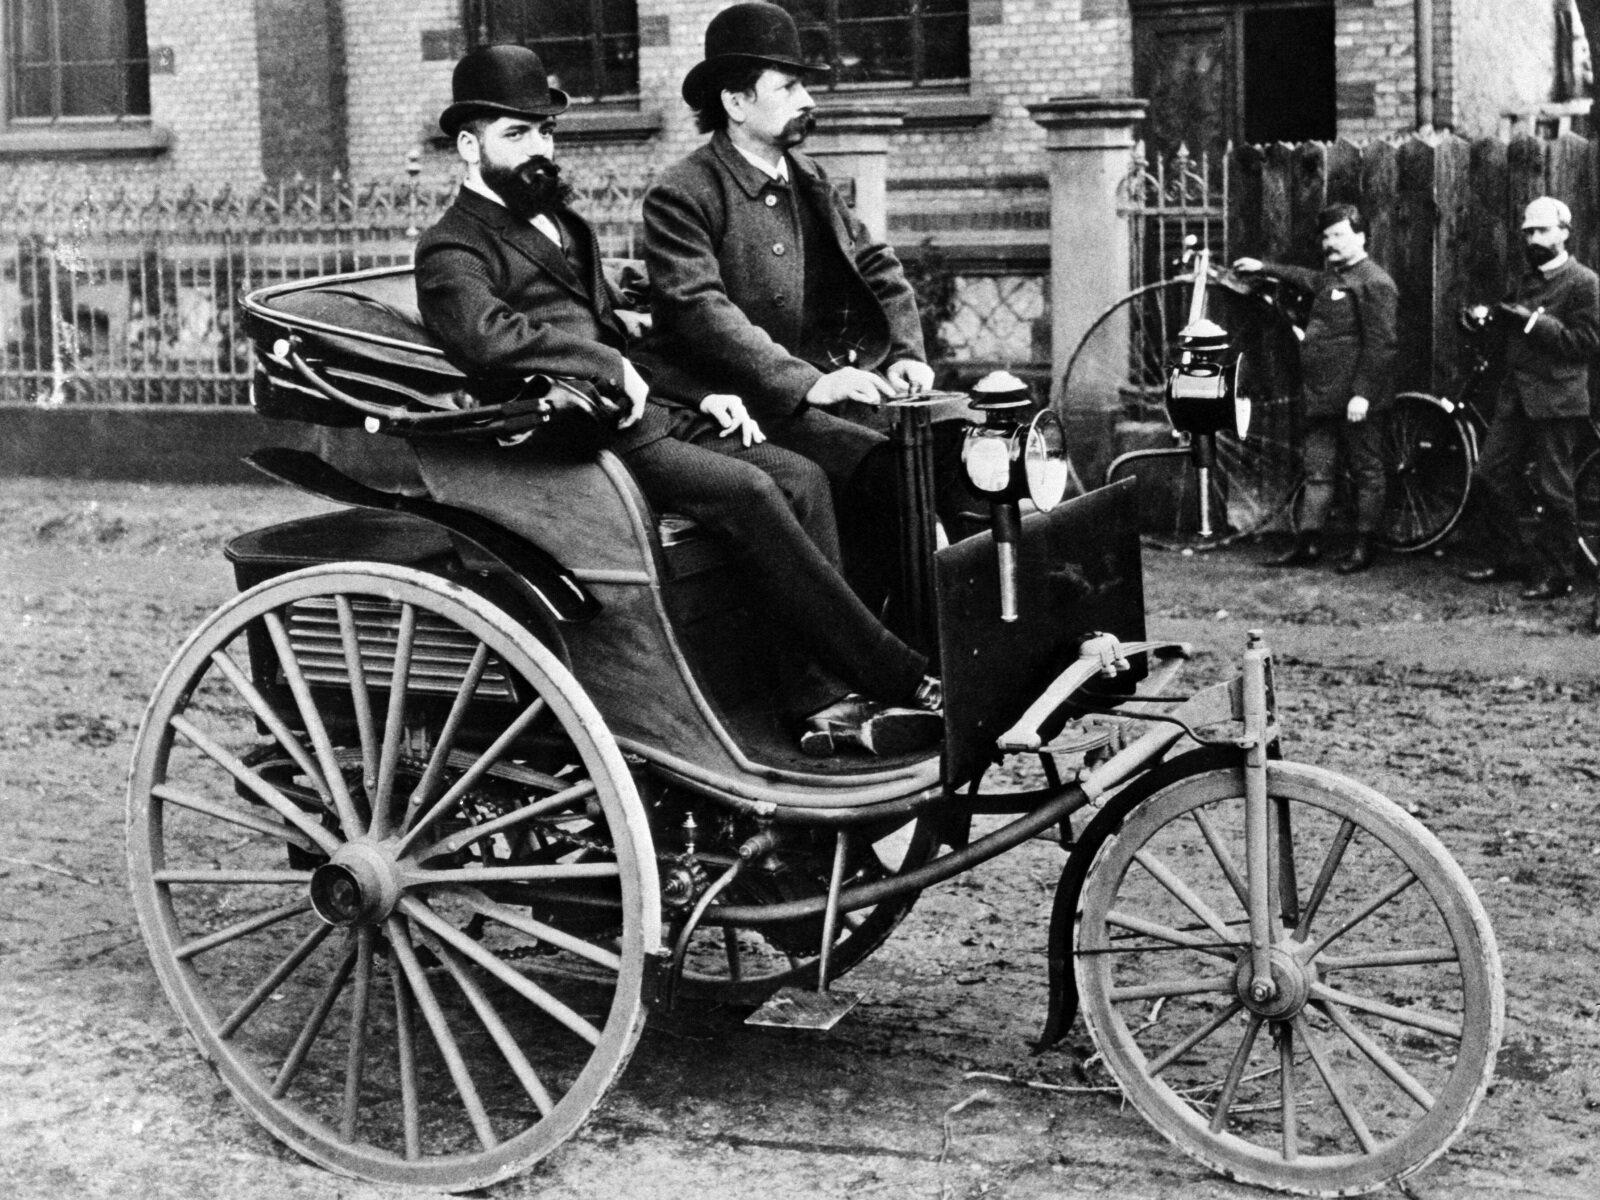 Benz Patent Motor Car, 1886 - 1894 - Media Database